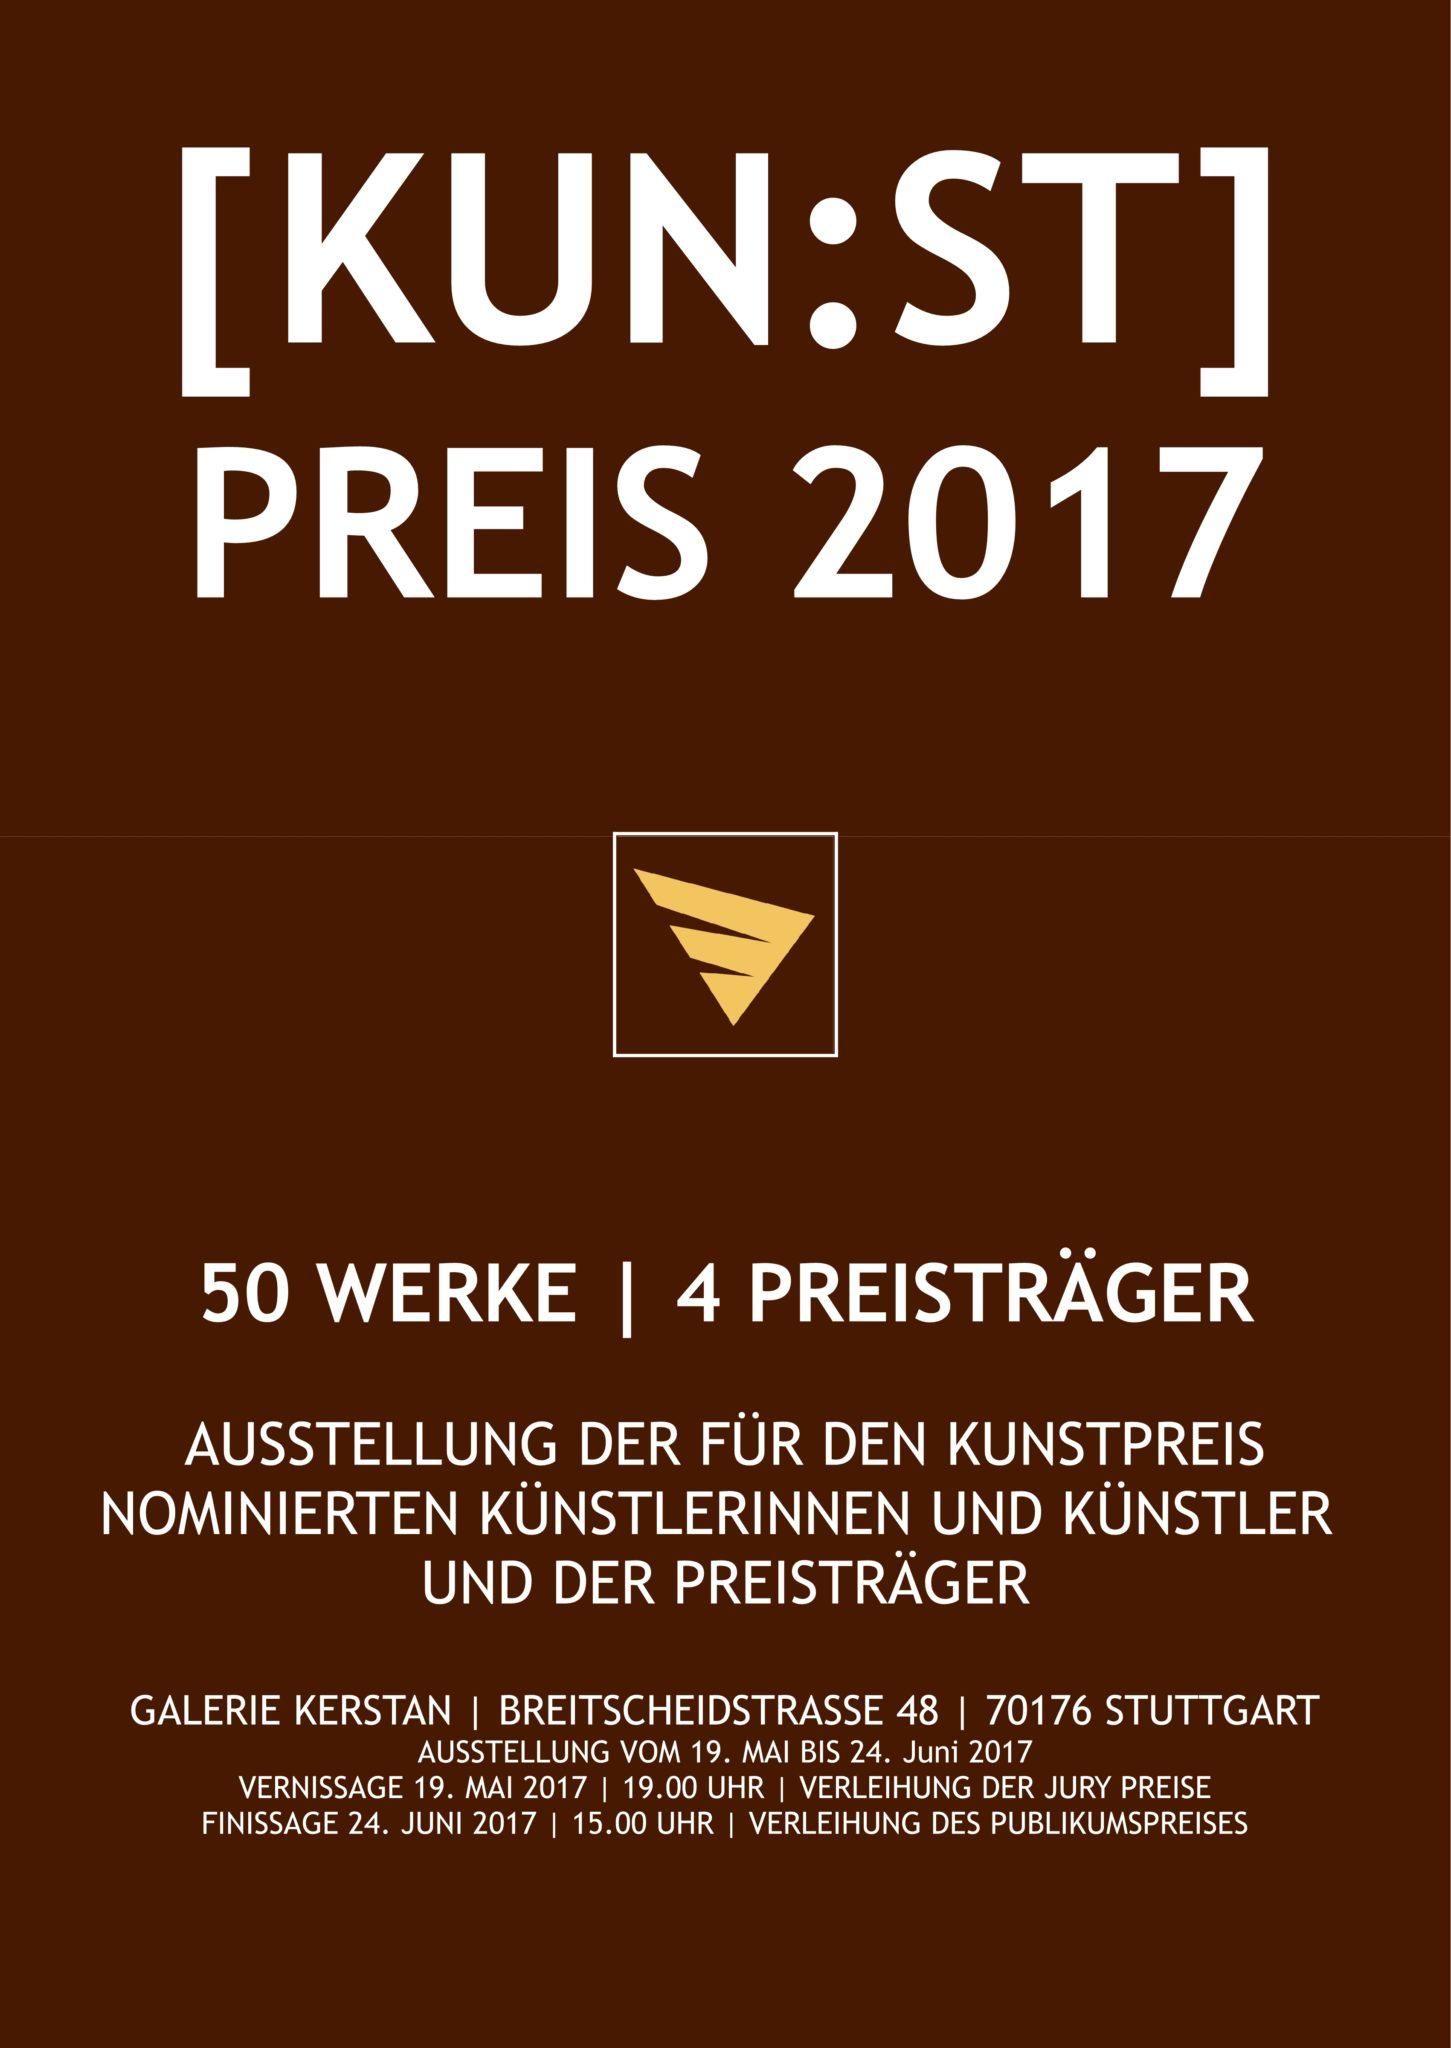 Kunstpreis 2017